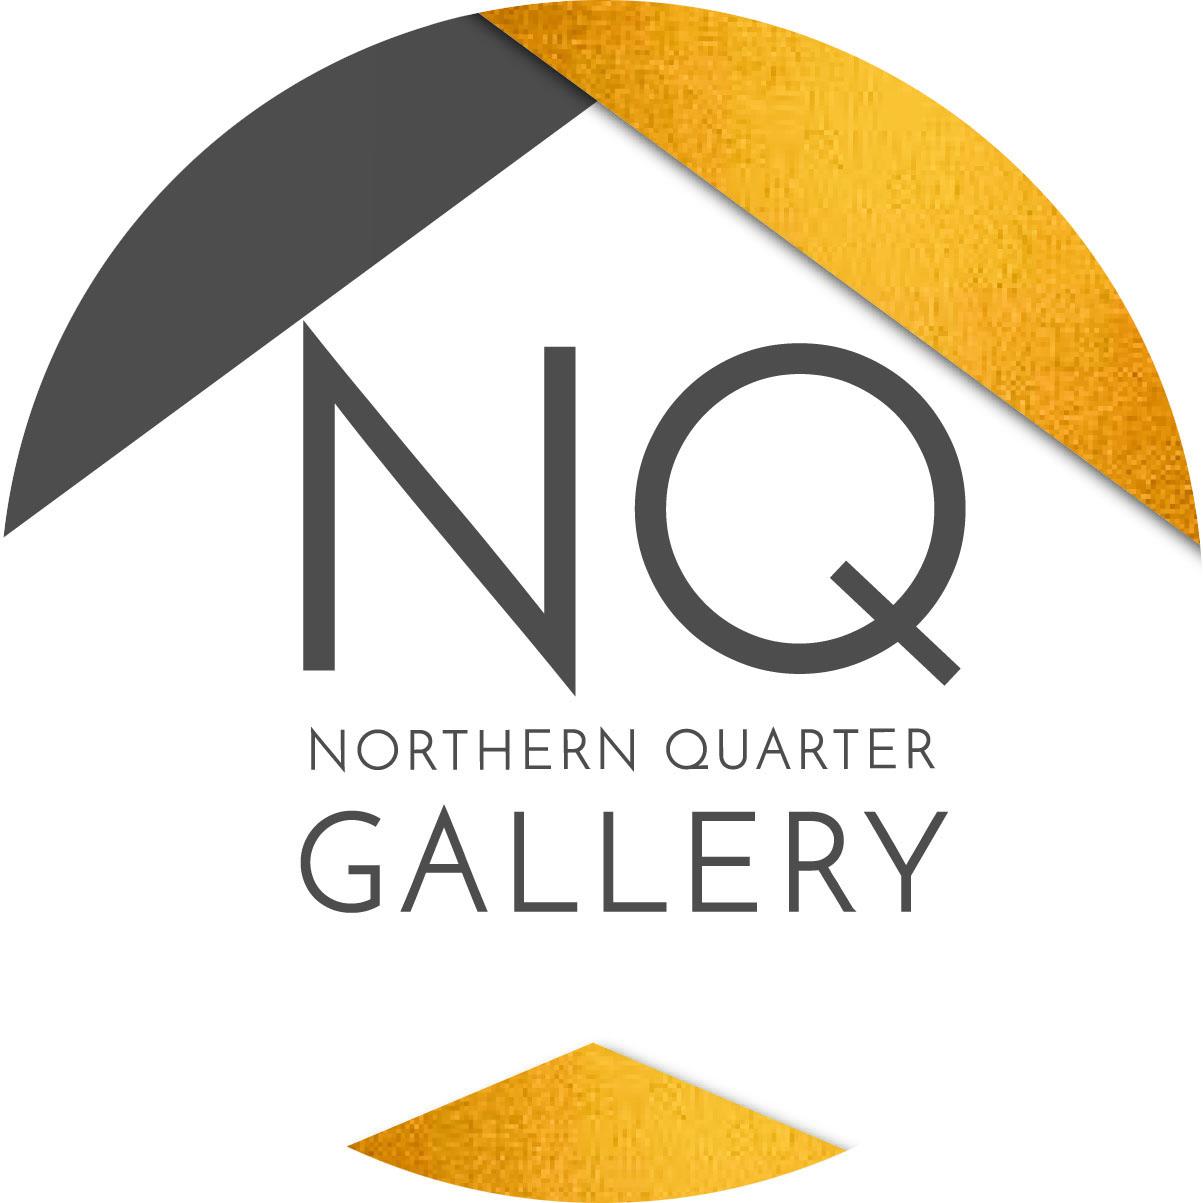 Northern Quarter Gallery